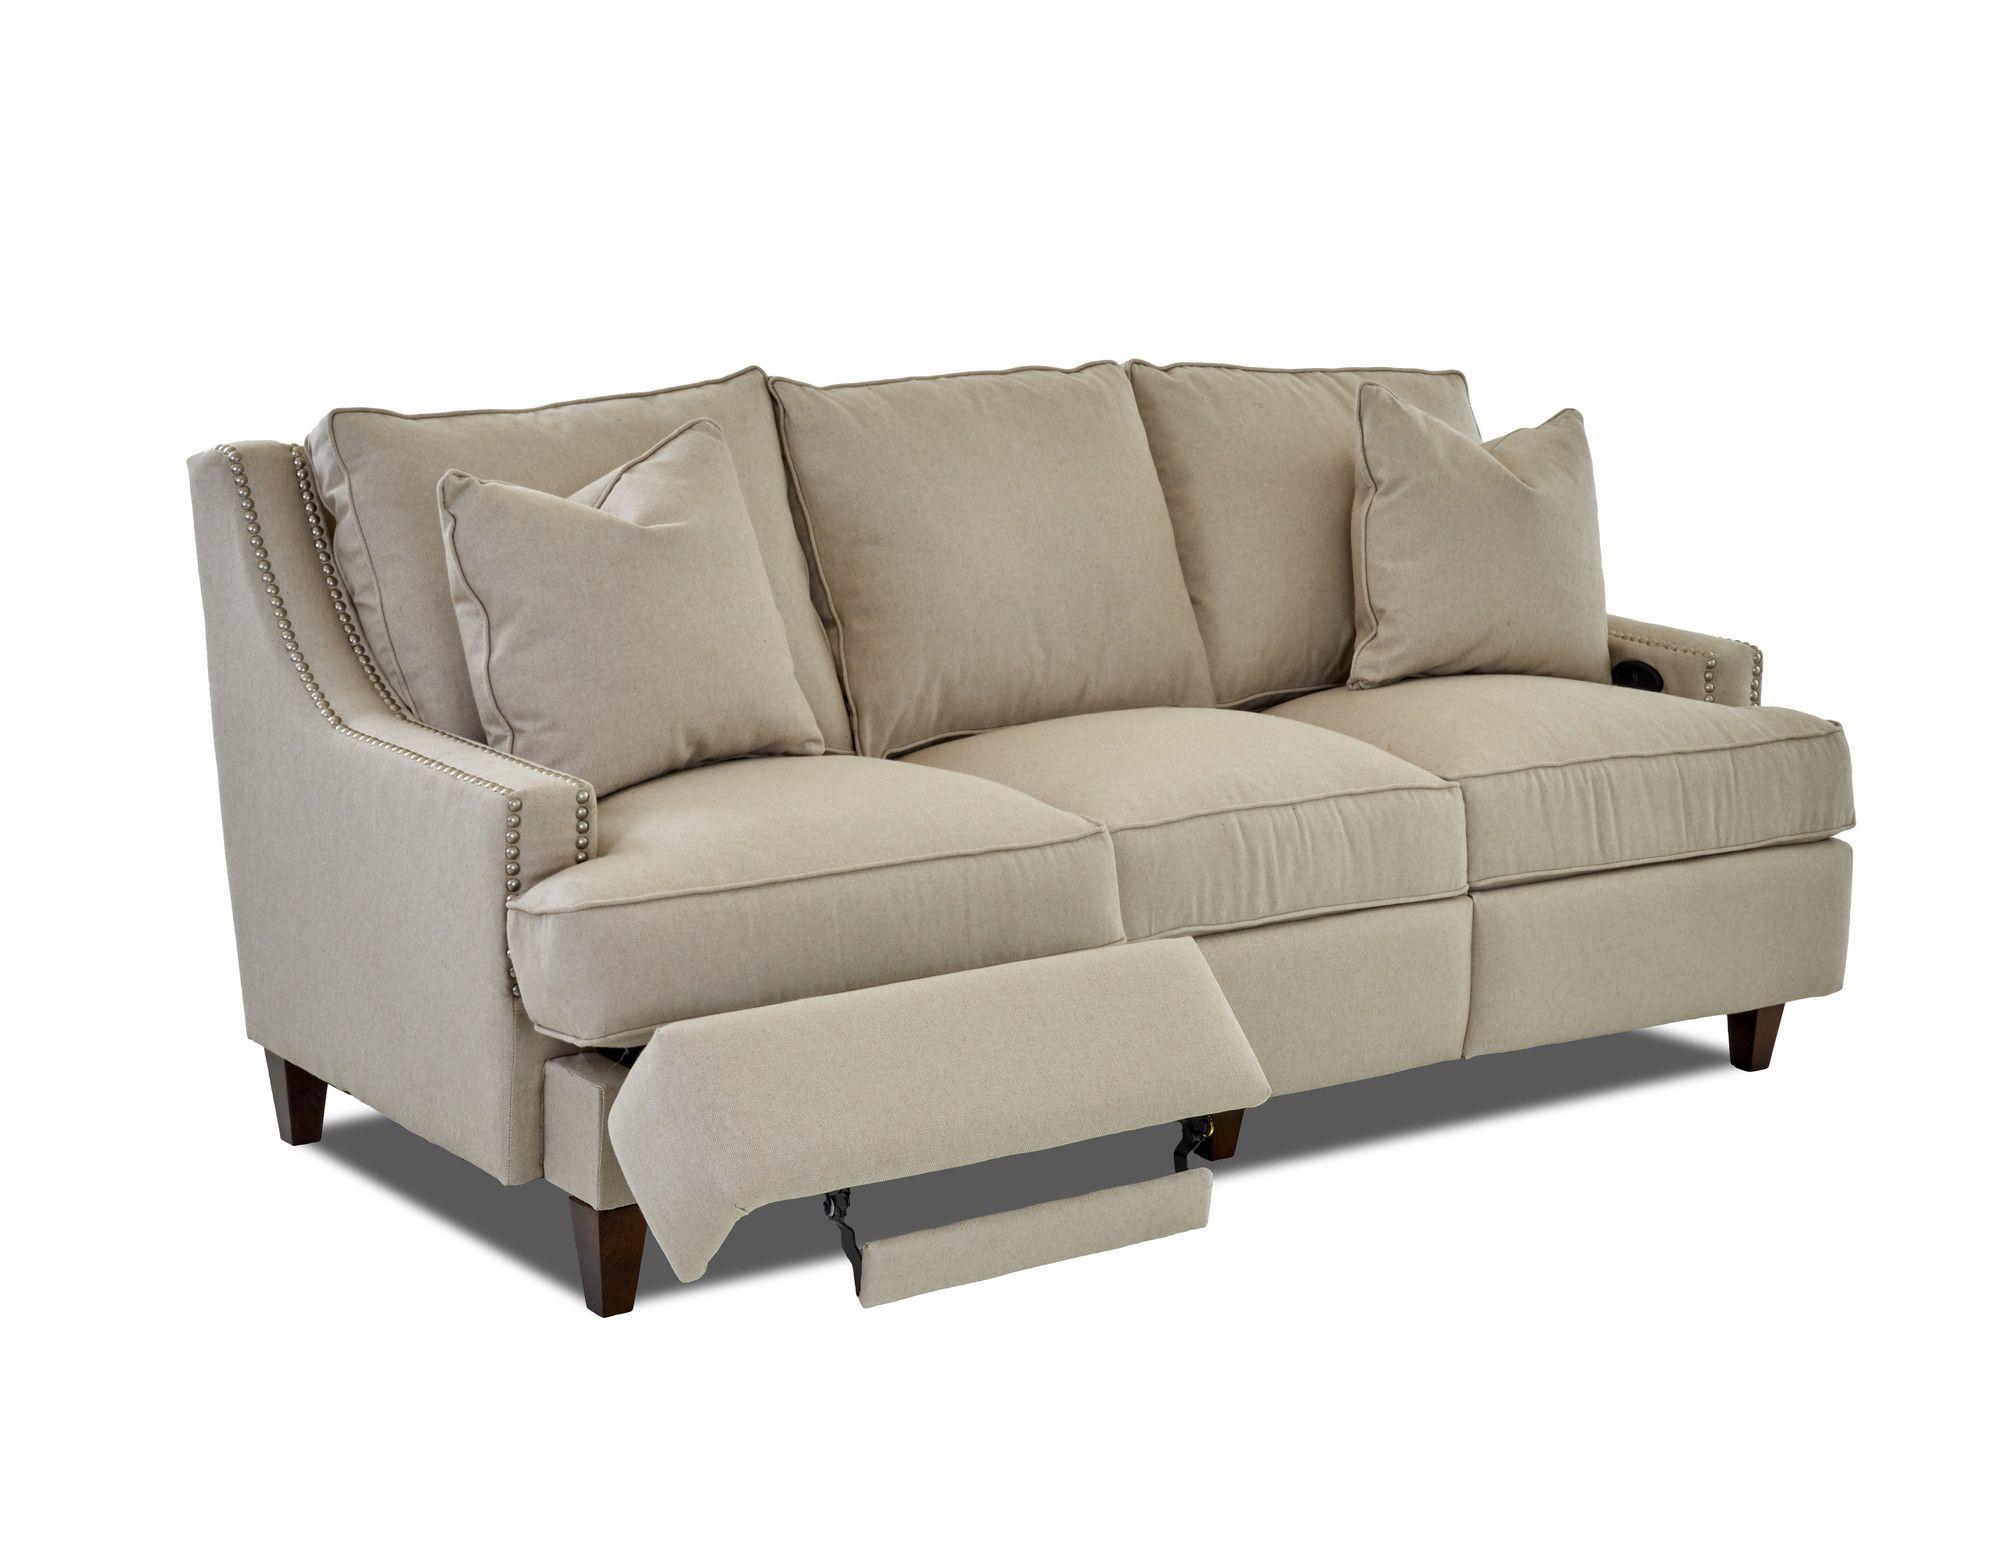 Wayfair Custom Upholstery Tricia Power Hybrid Reclining Sofa